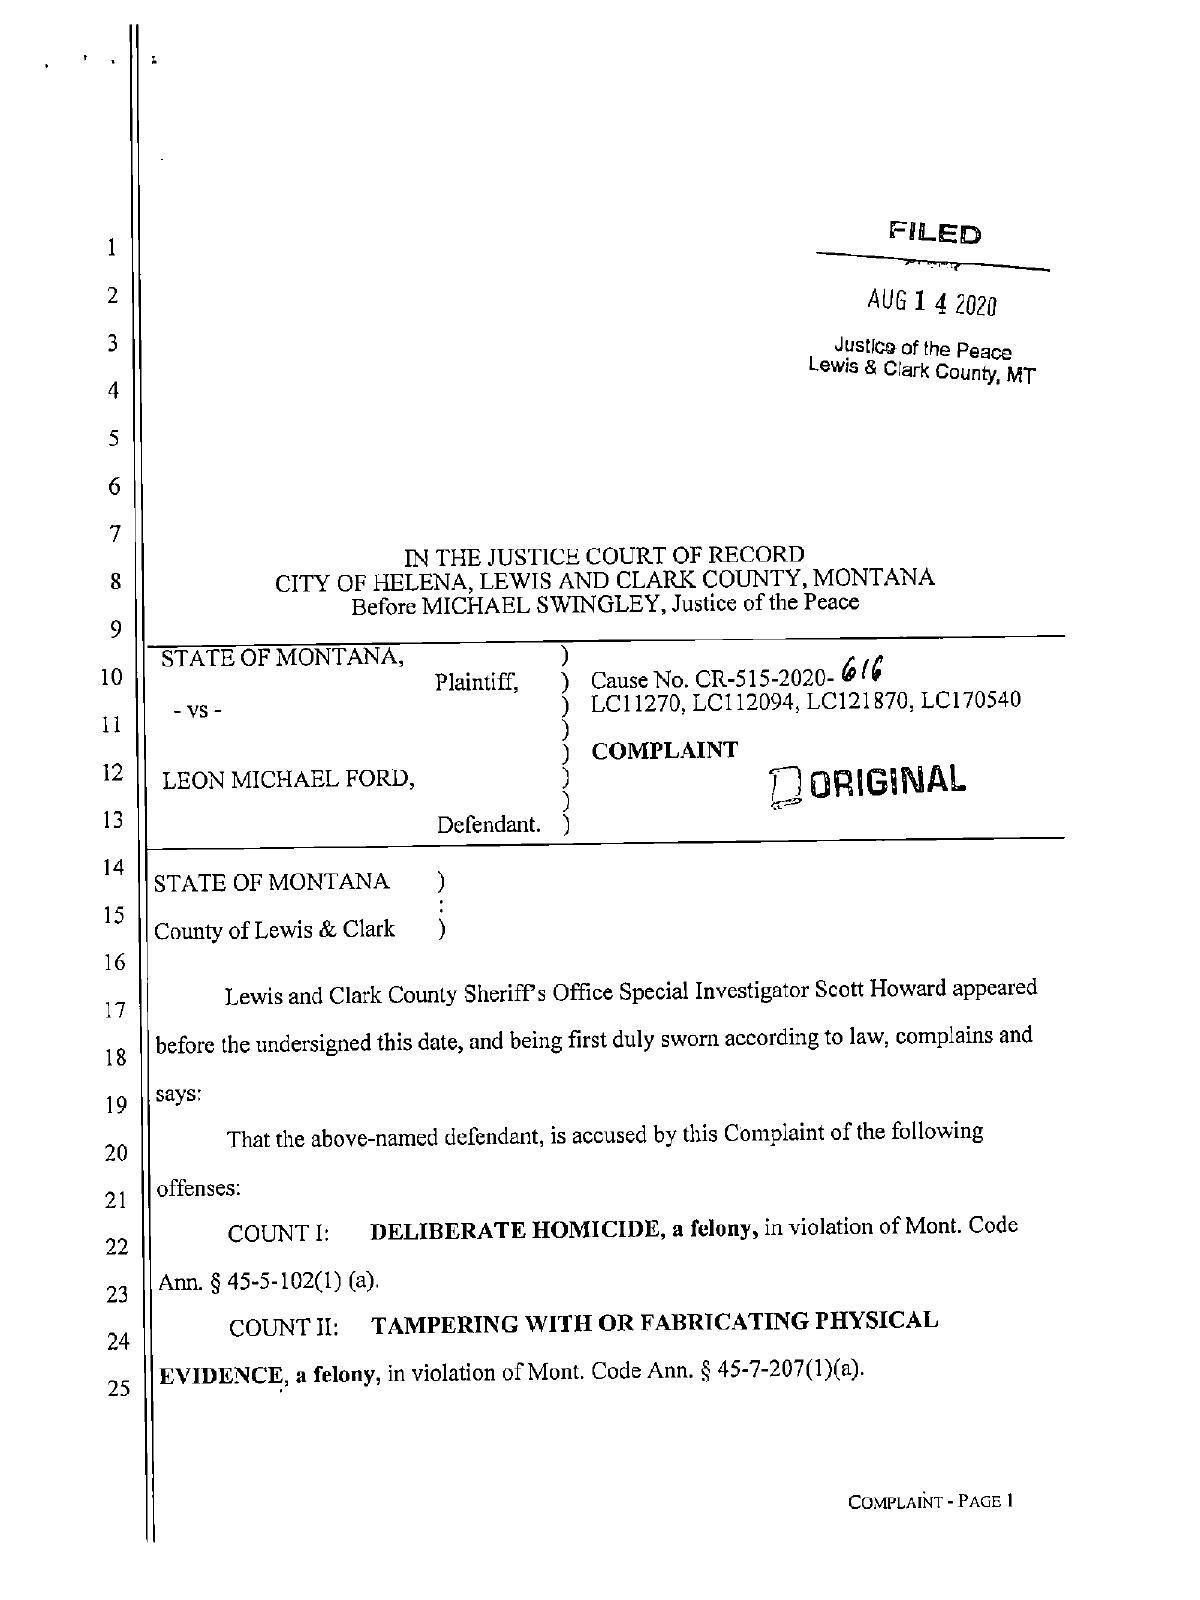 Mike Crites affidavit